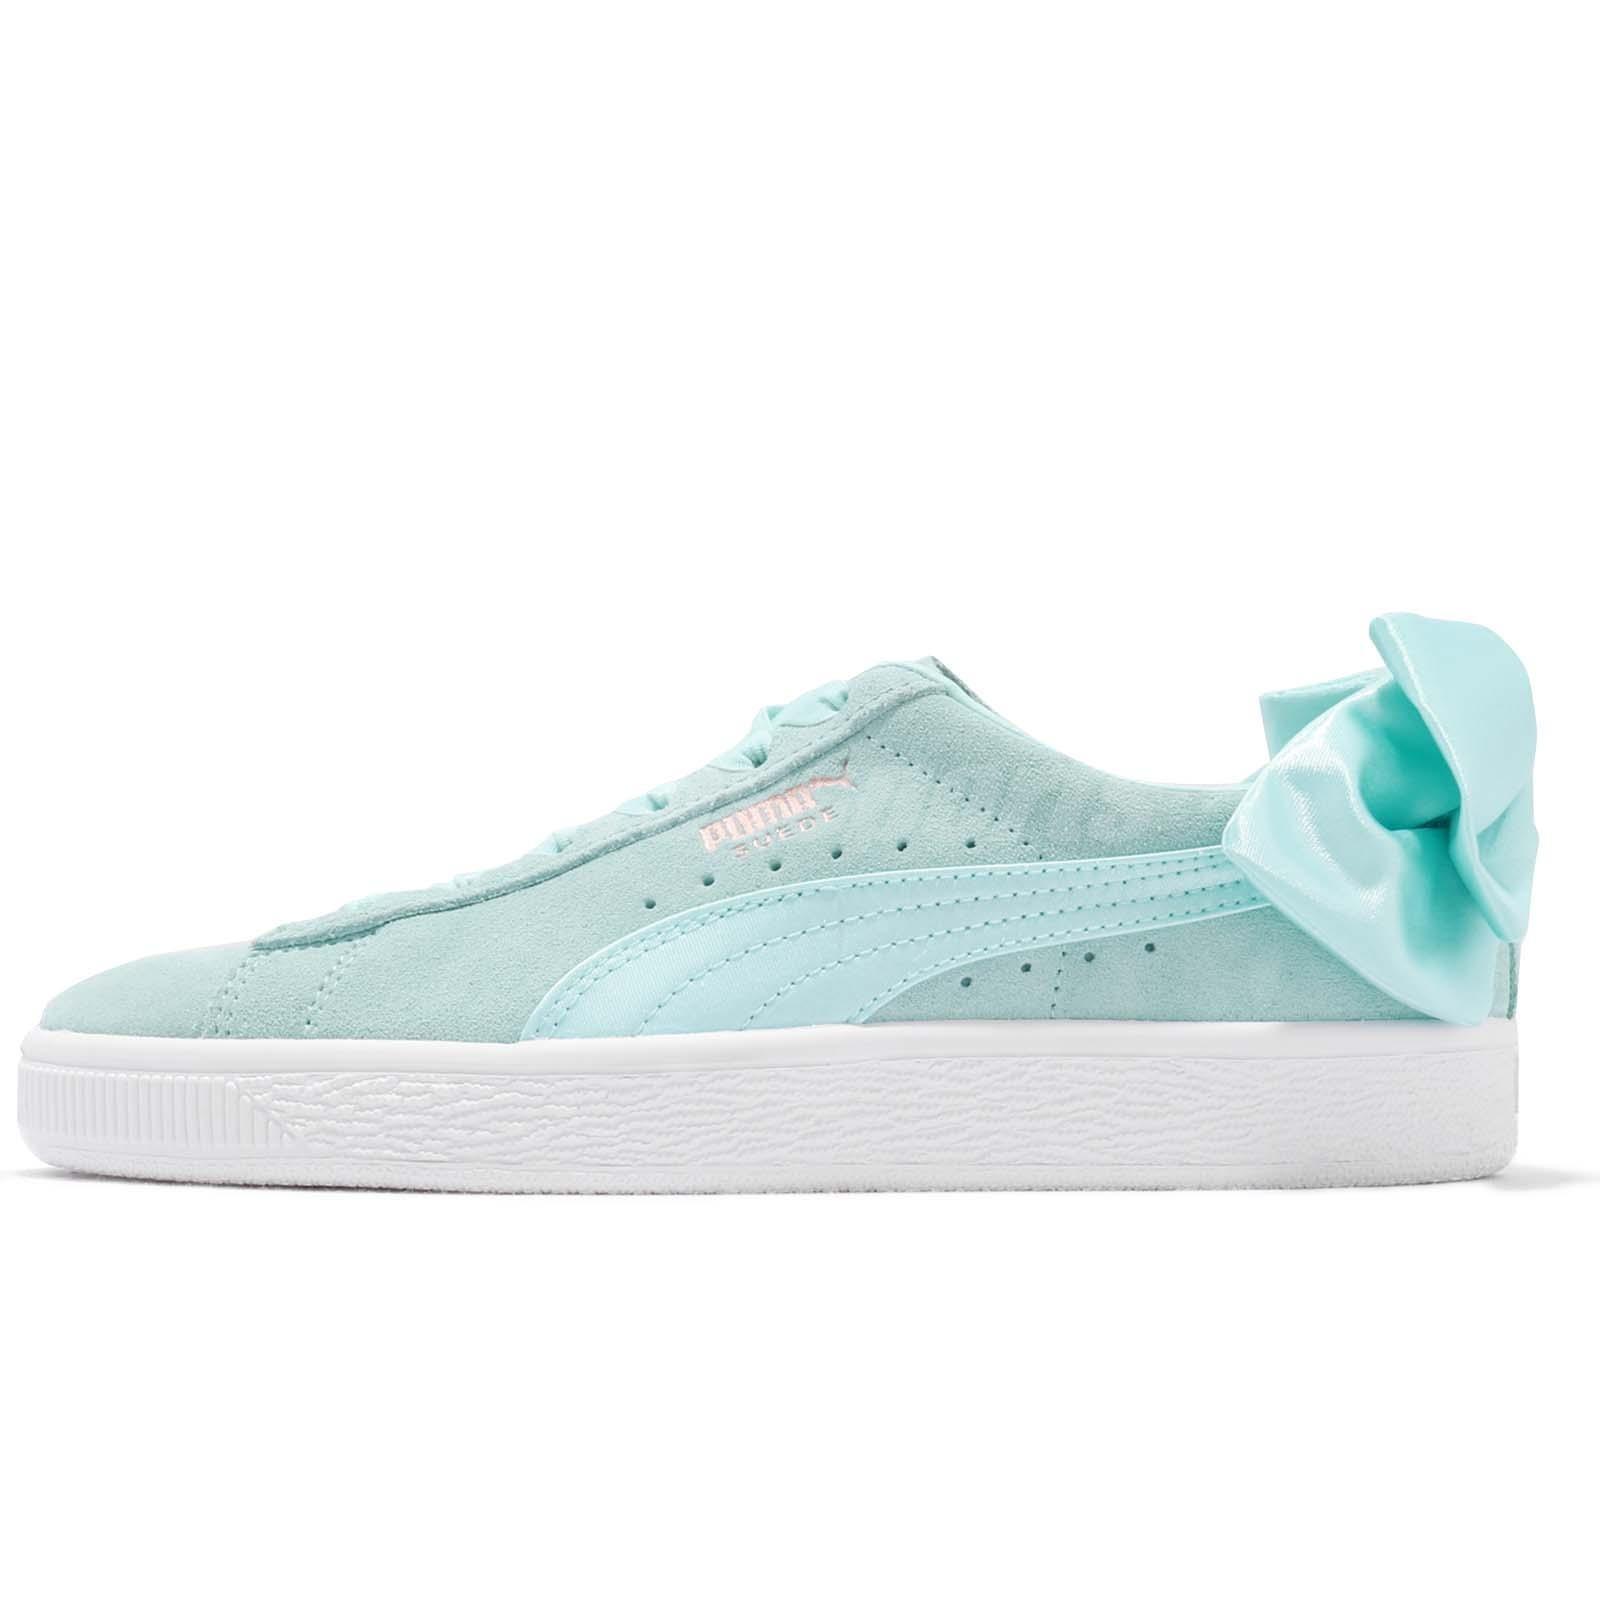 Scarpe donna sneakers PUMA SUEDE BOW WN'S in camoscio verde 367317 03